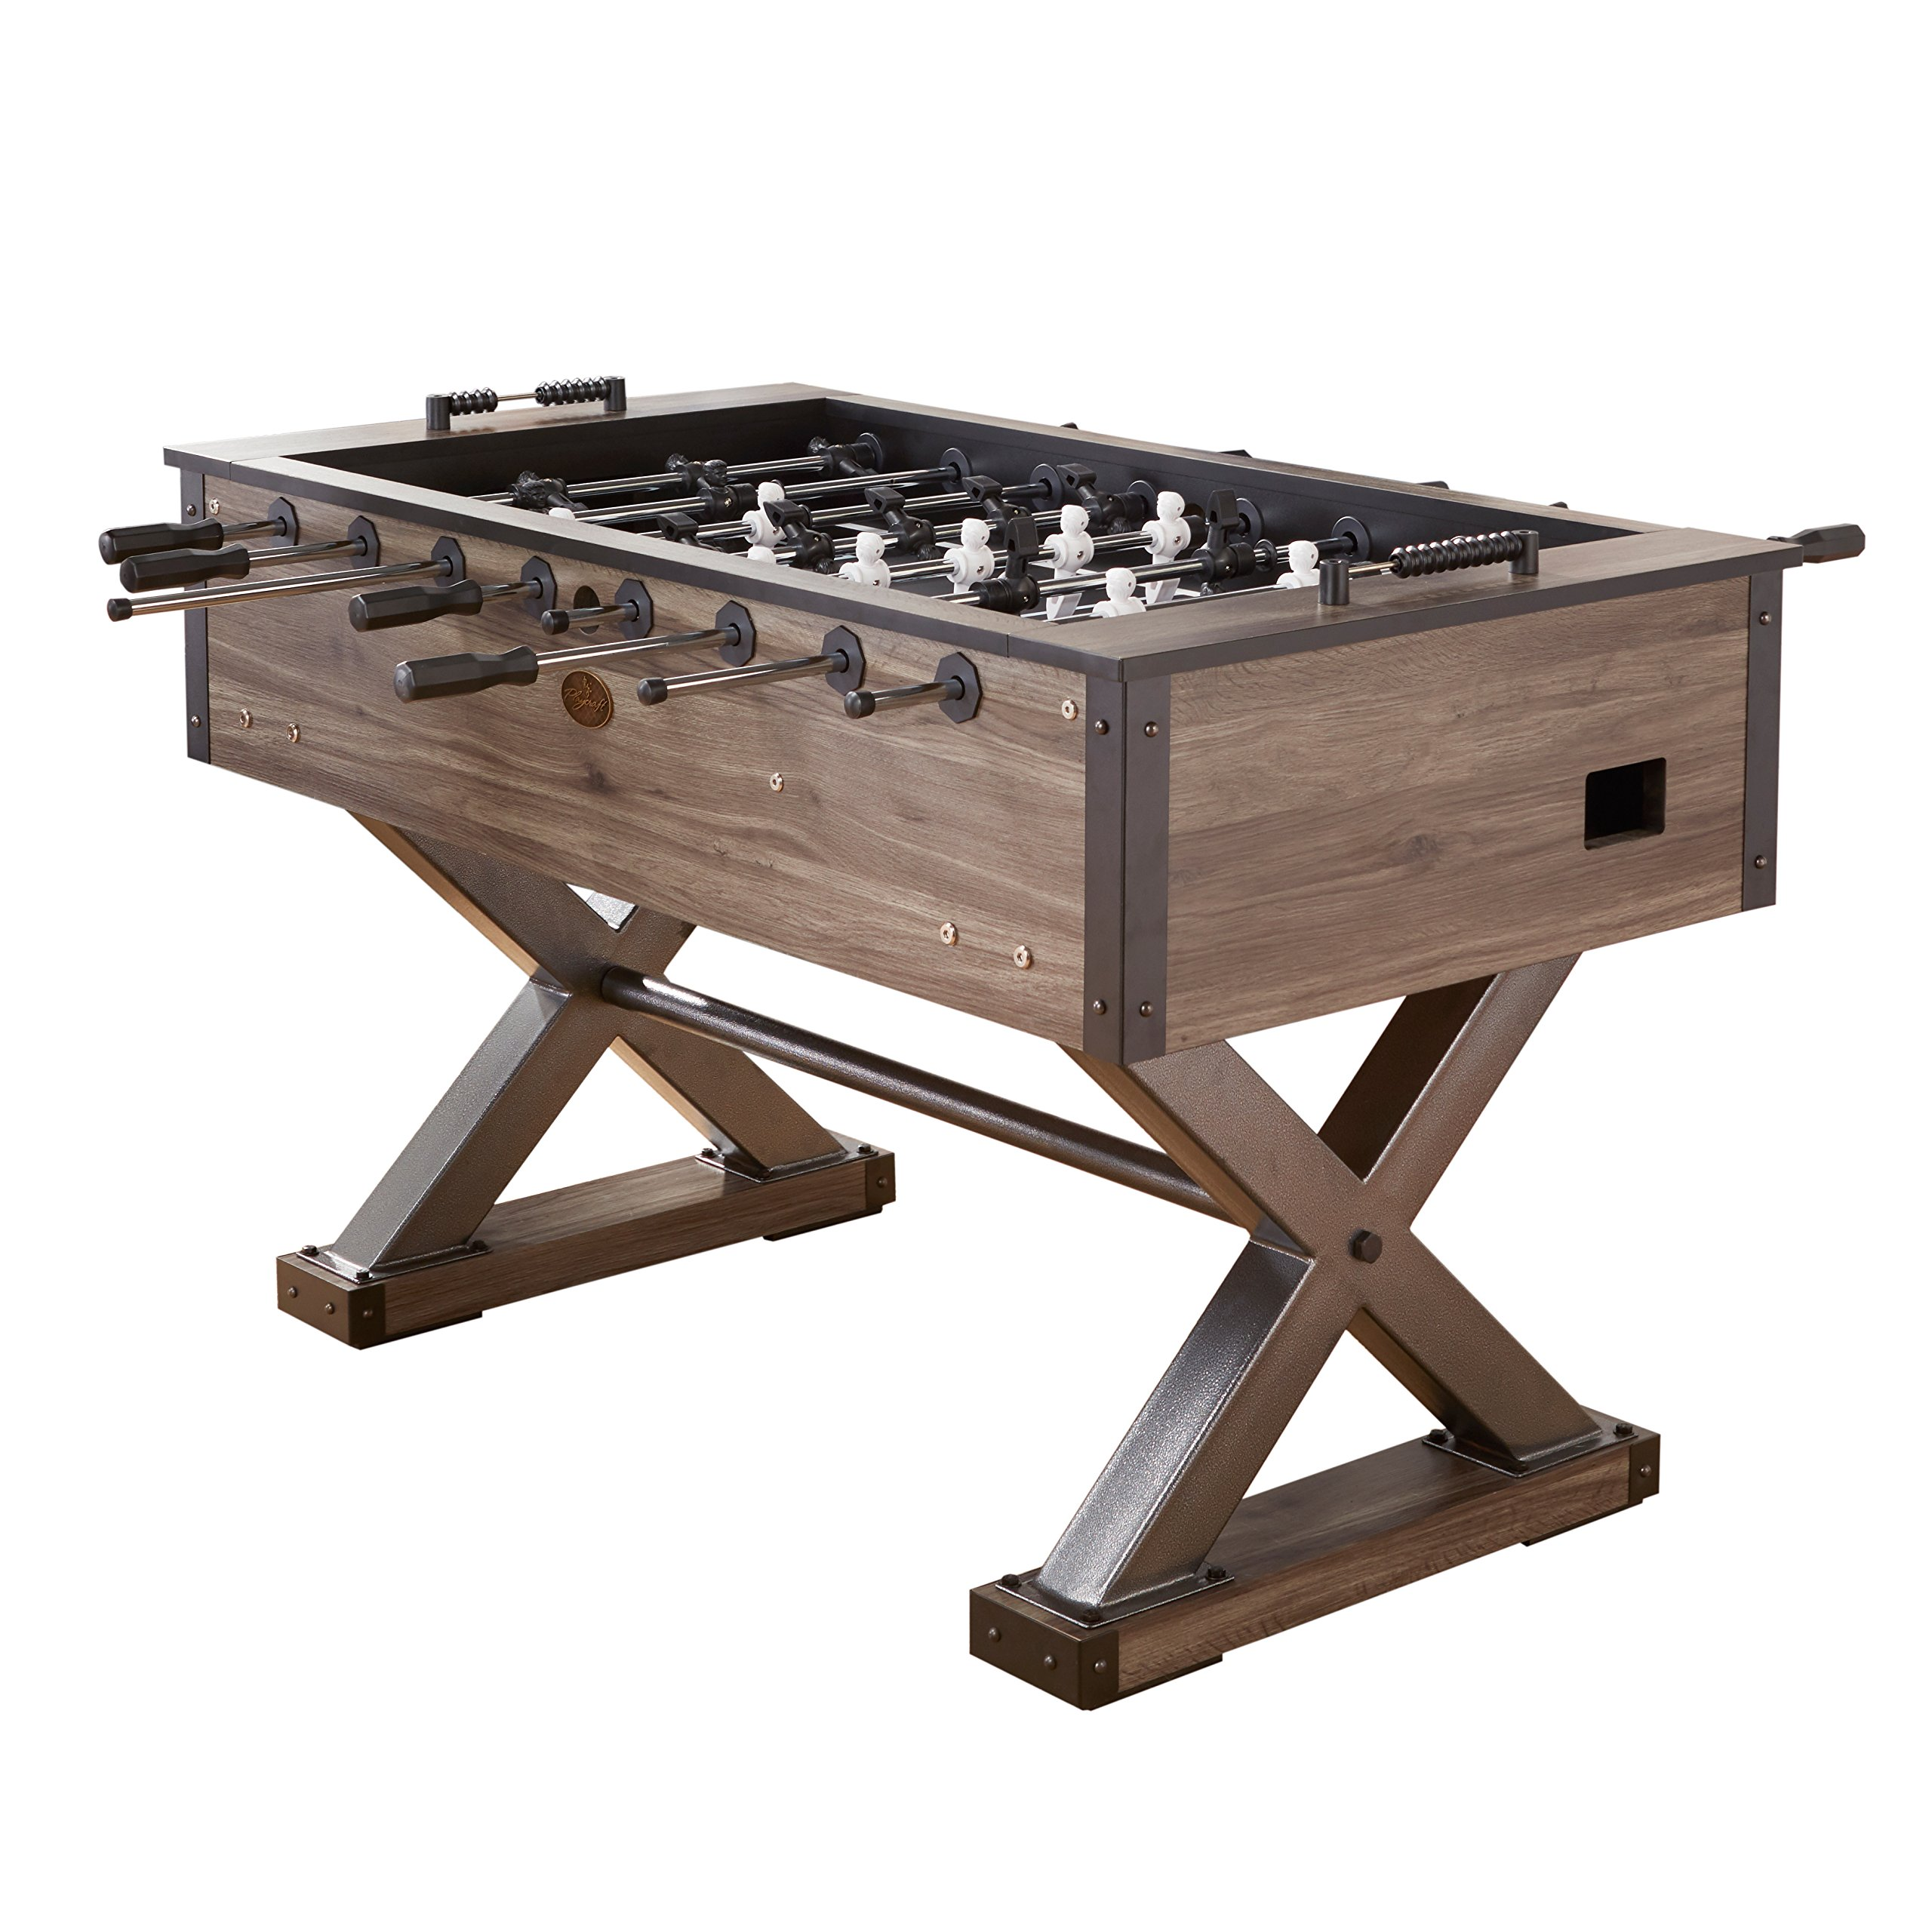 Playcraft Wolf Creek 56'' Foosball Table, Weathered Gray by Playcraft